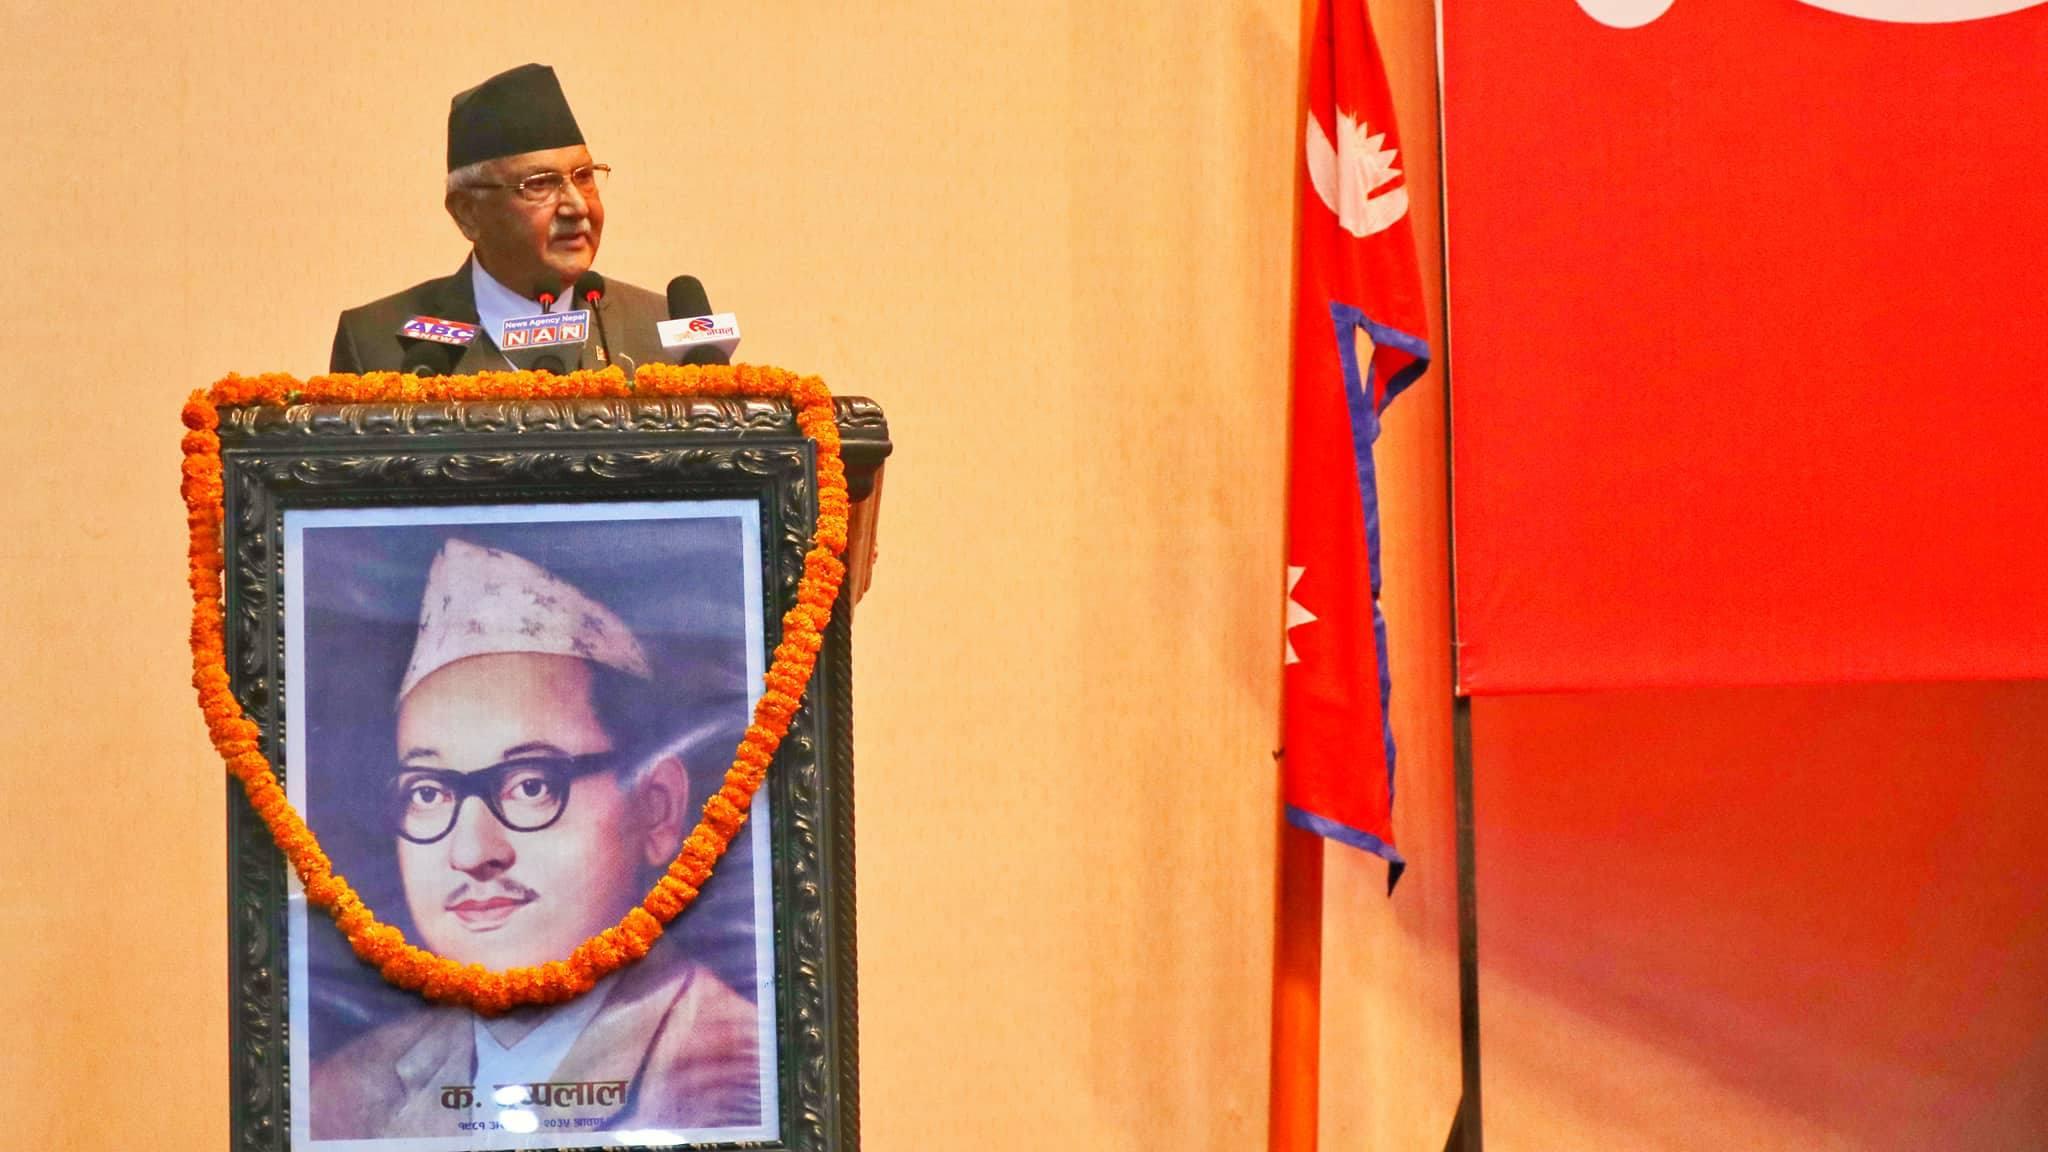 """What has Nepali Congress done?"" Oli fumes fire"